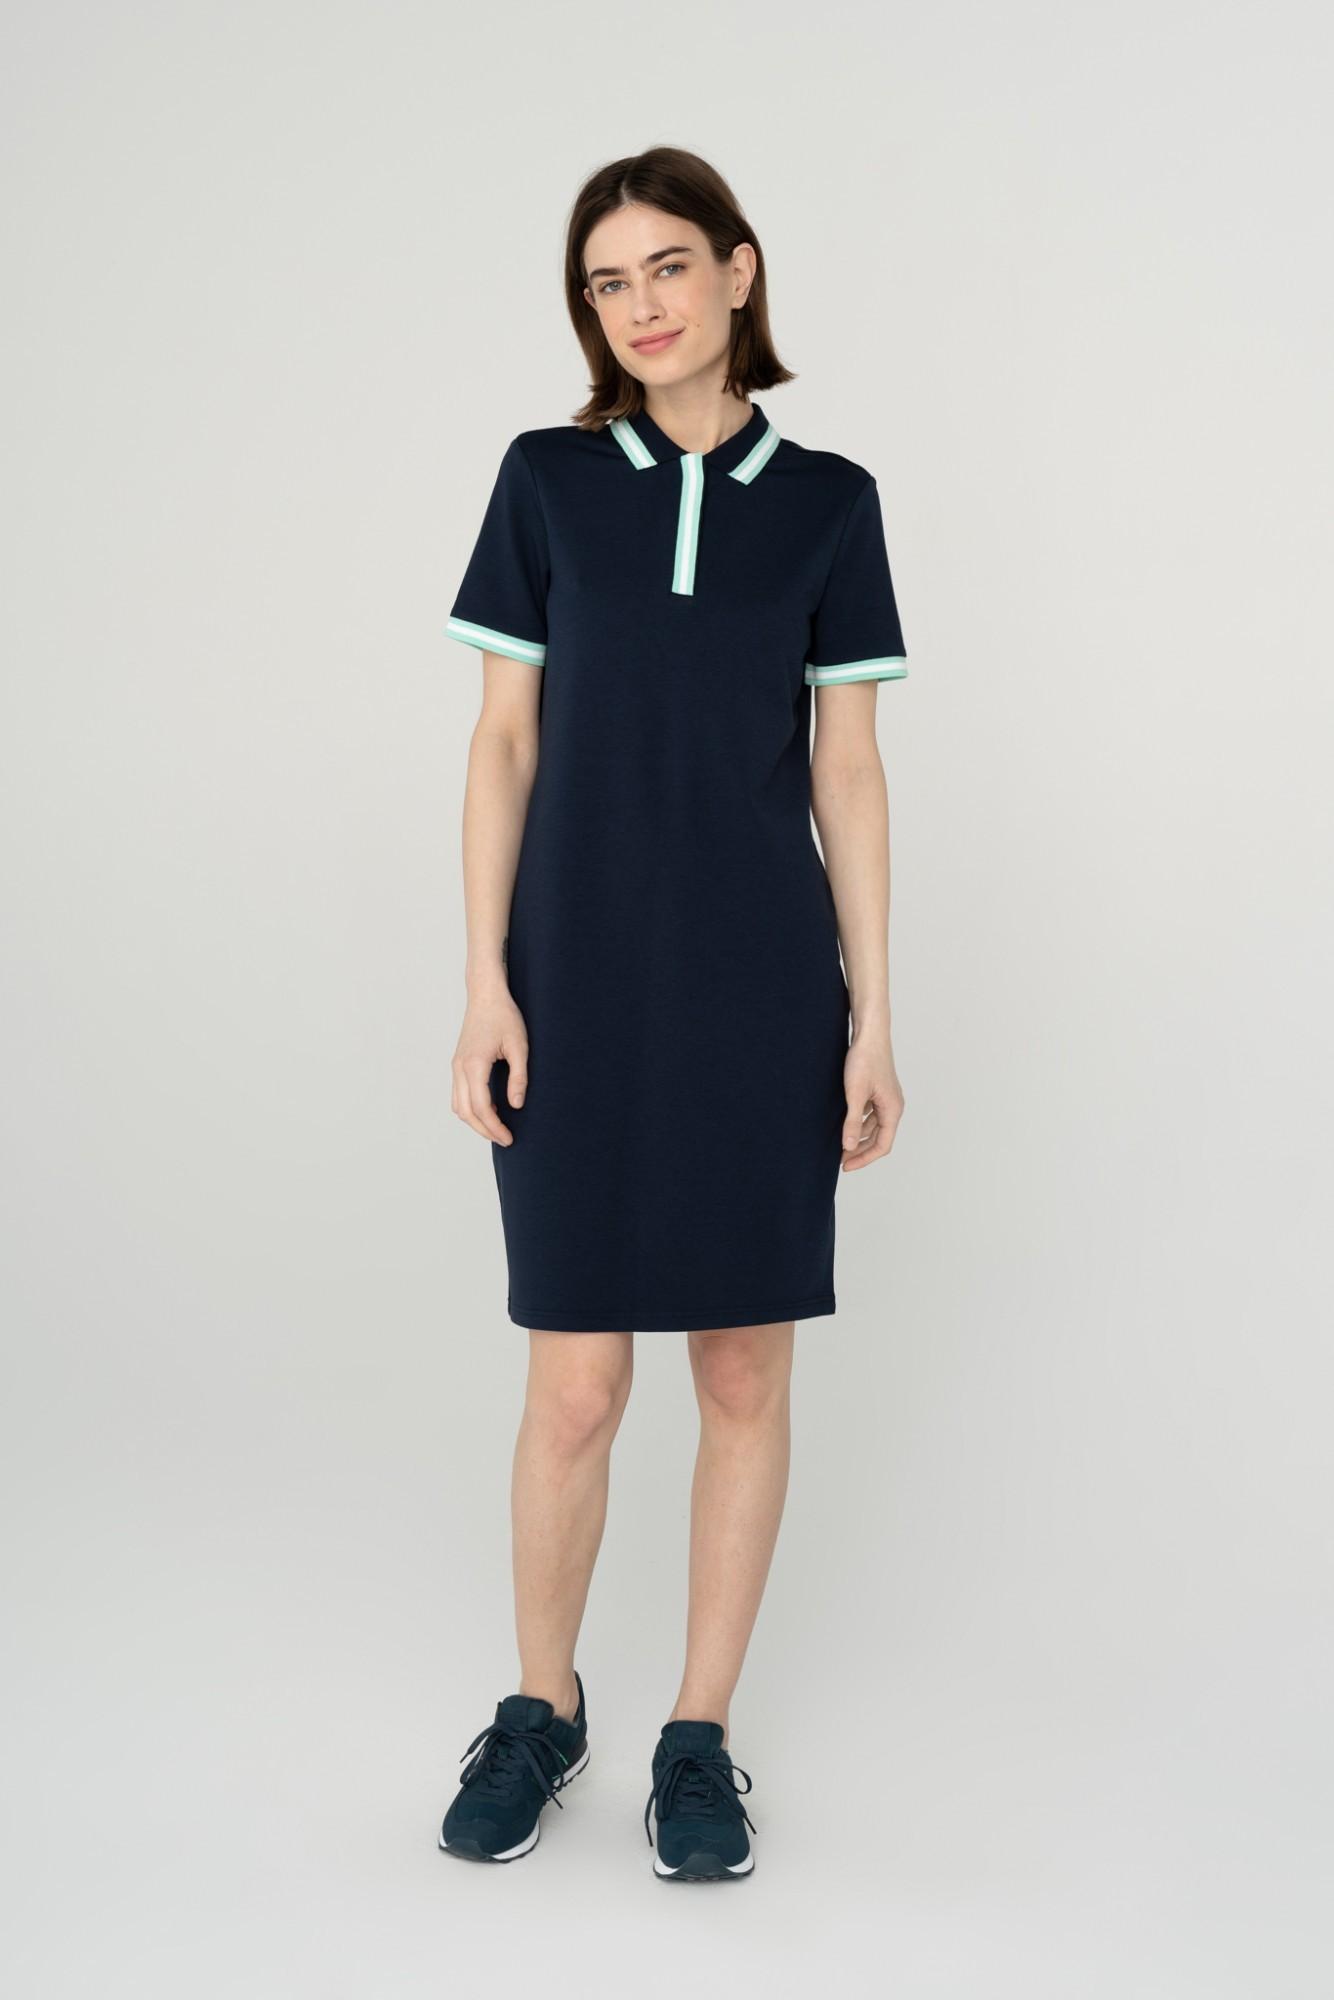 AUDIMAS Švelni modalo polo suknelė 2111-172 Navy Blazer XL